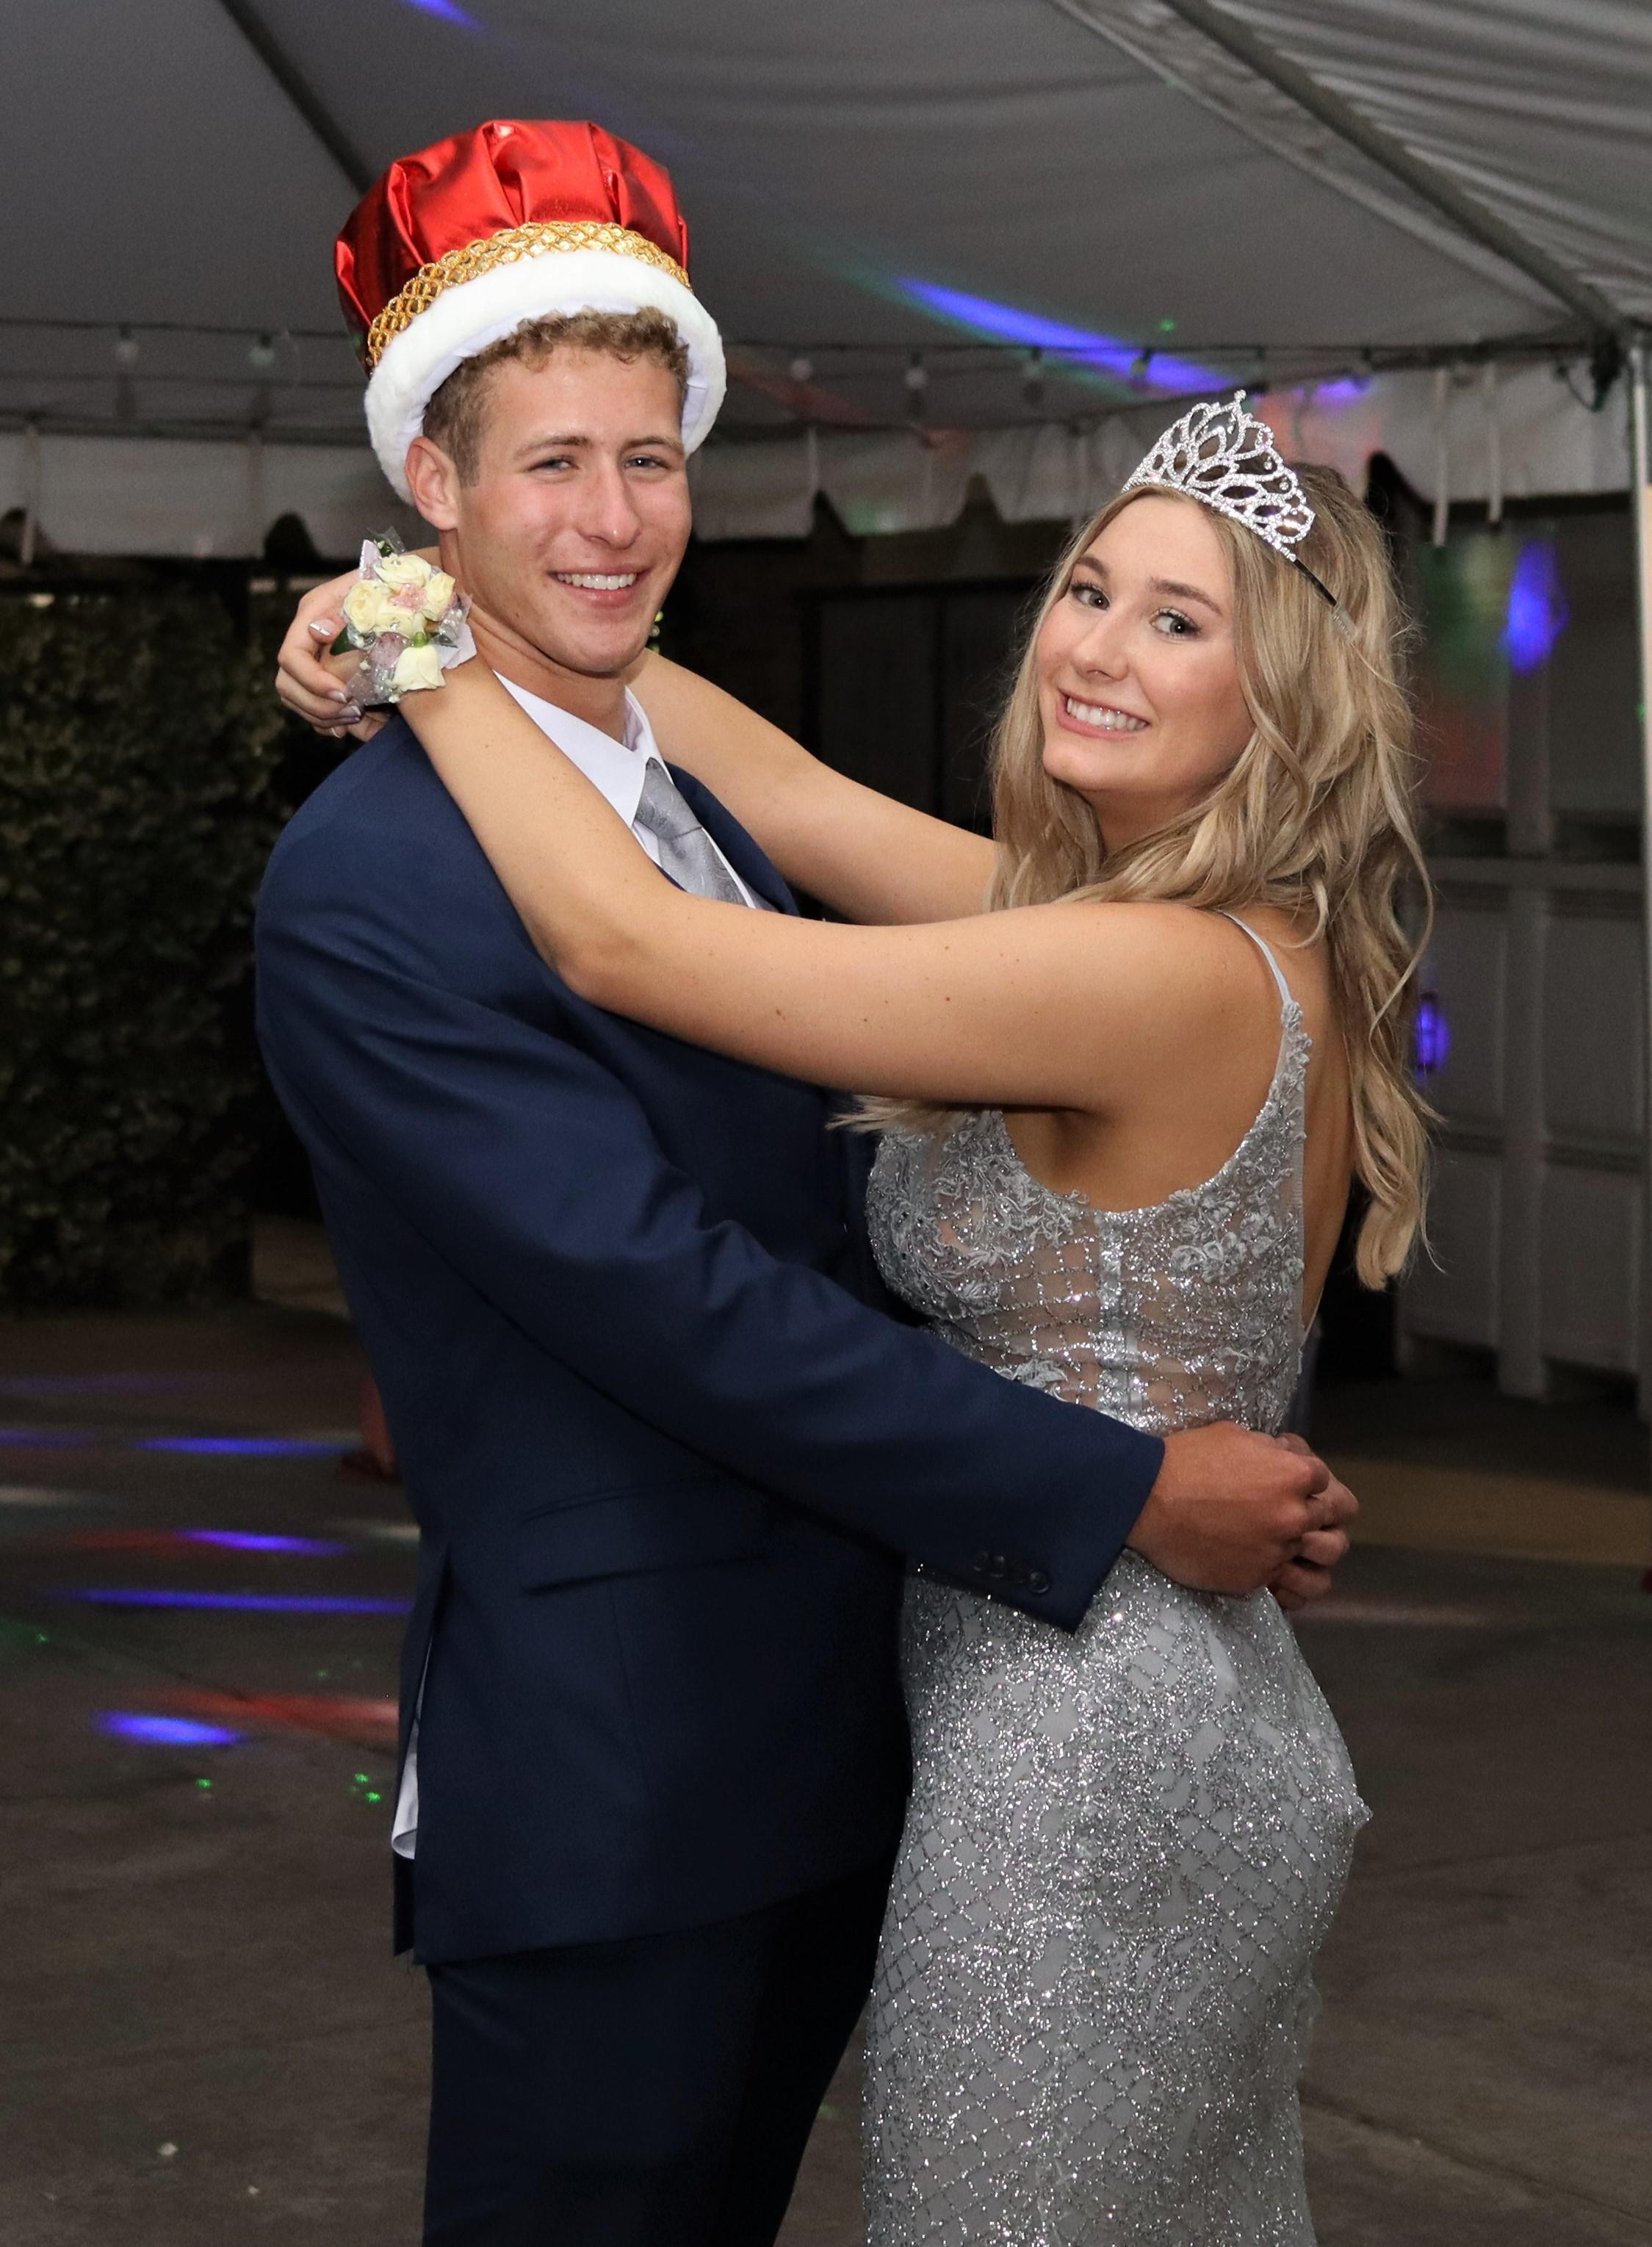 Prom King Joye Hughes and Prom King Jack Crawford